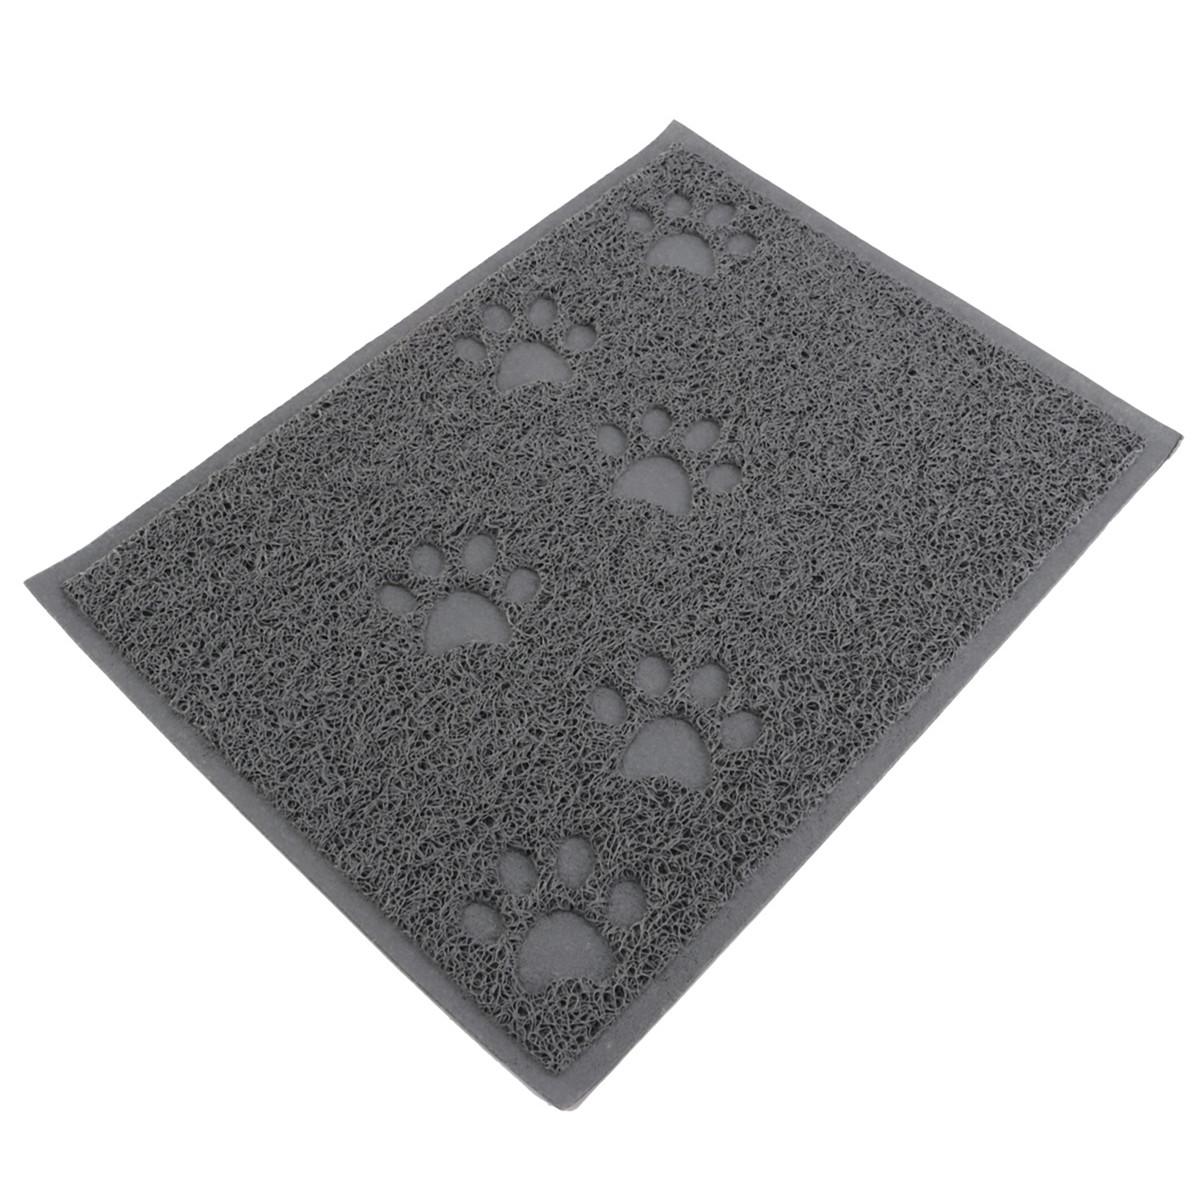 New Square PVC Placemat Dog Puppy Pet Cat Dish Bowl Food ... - photo#38